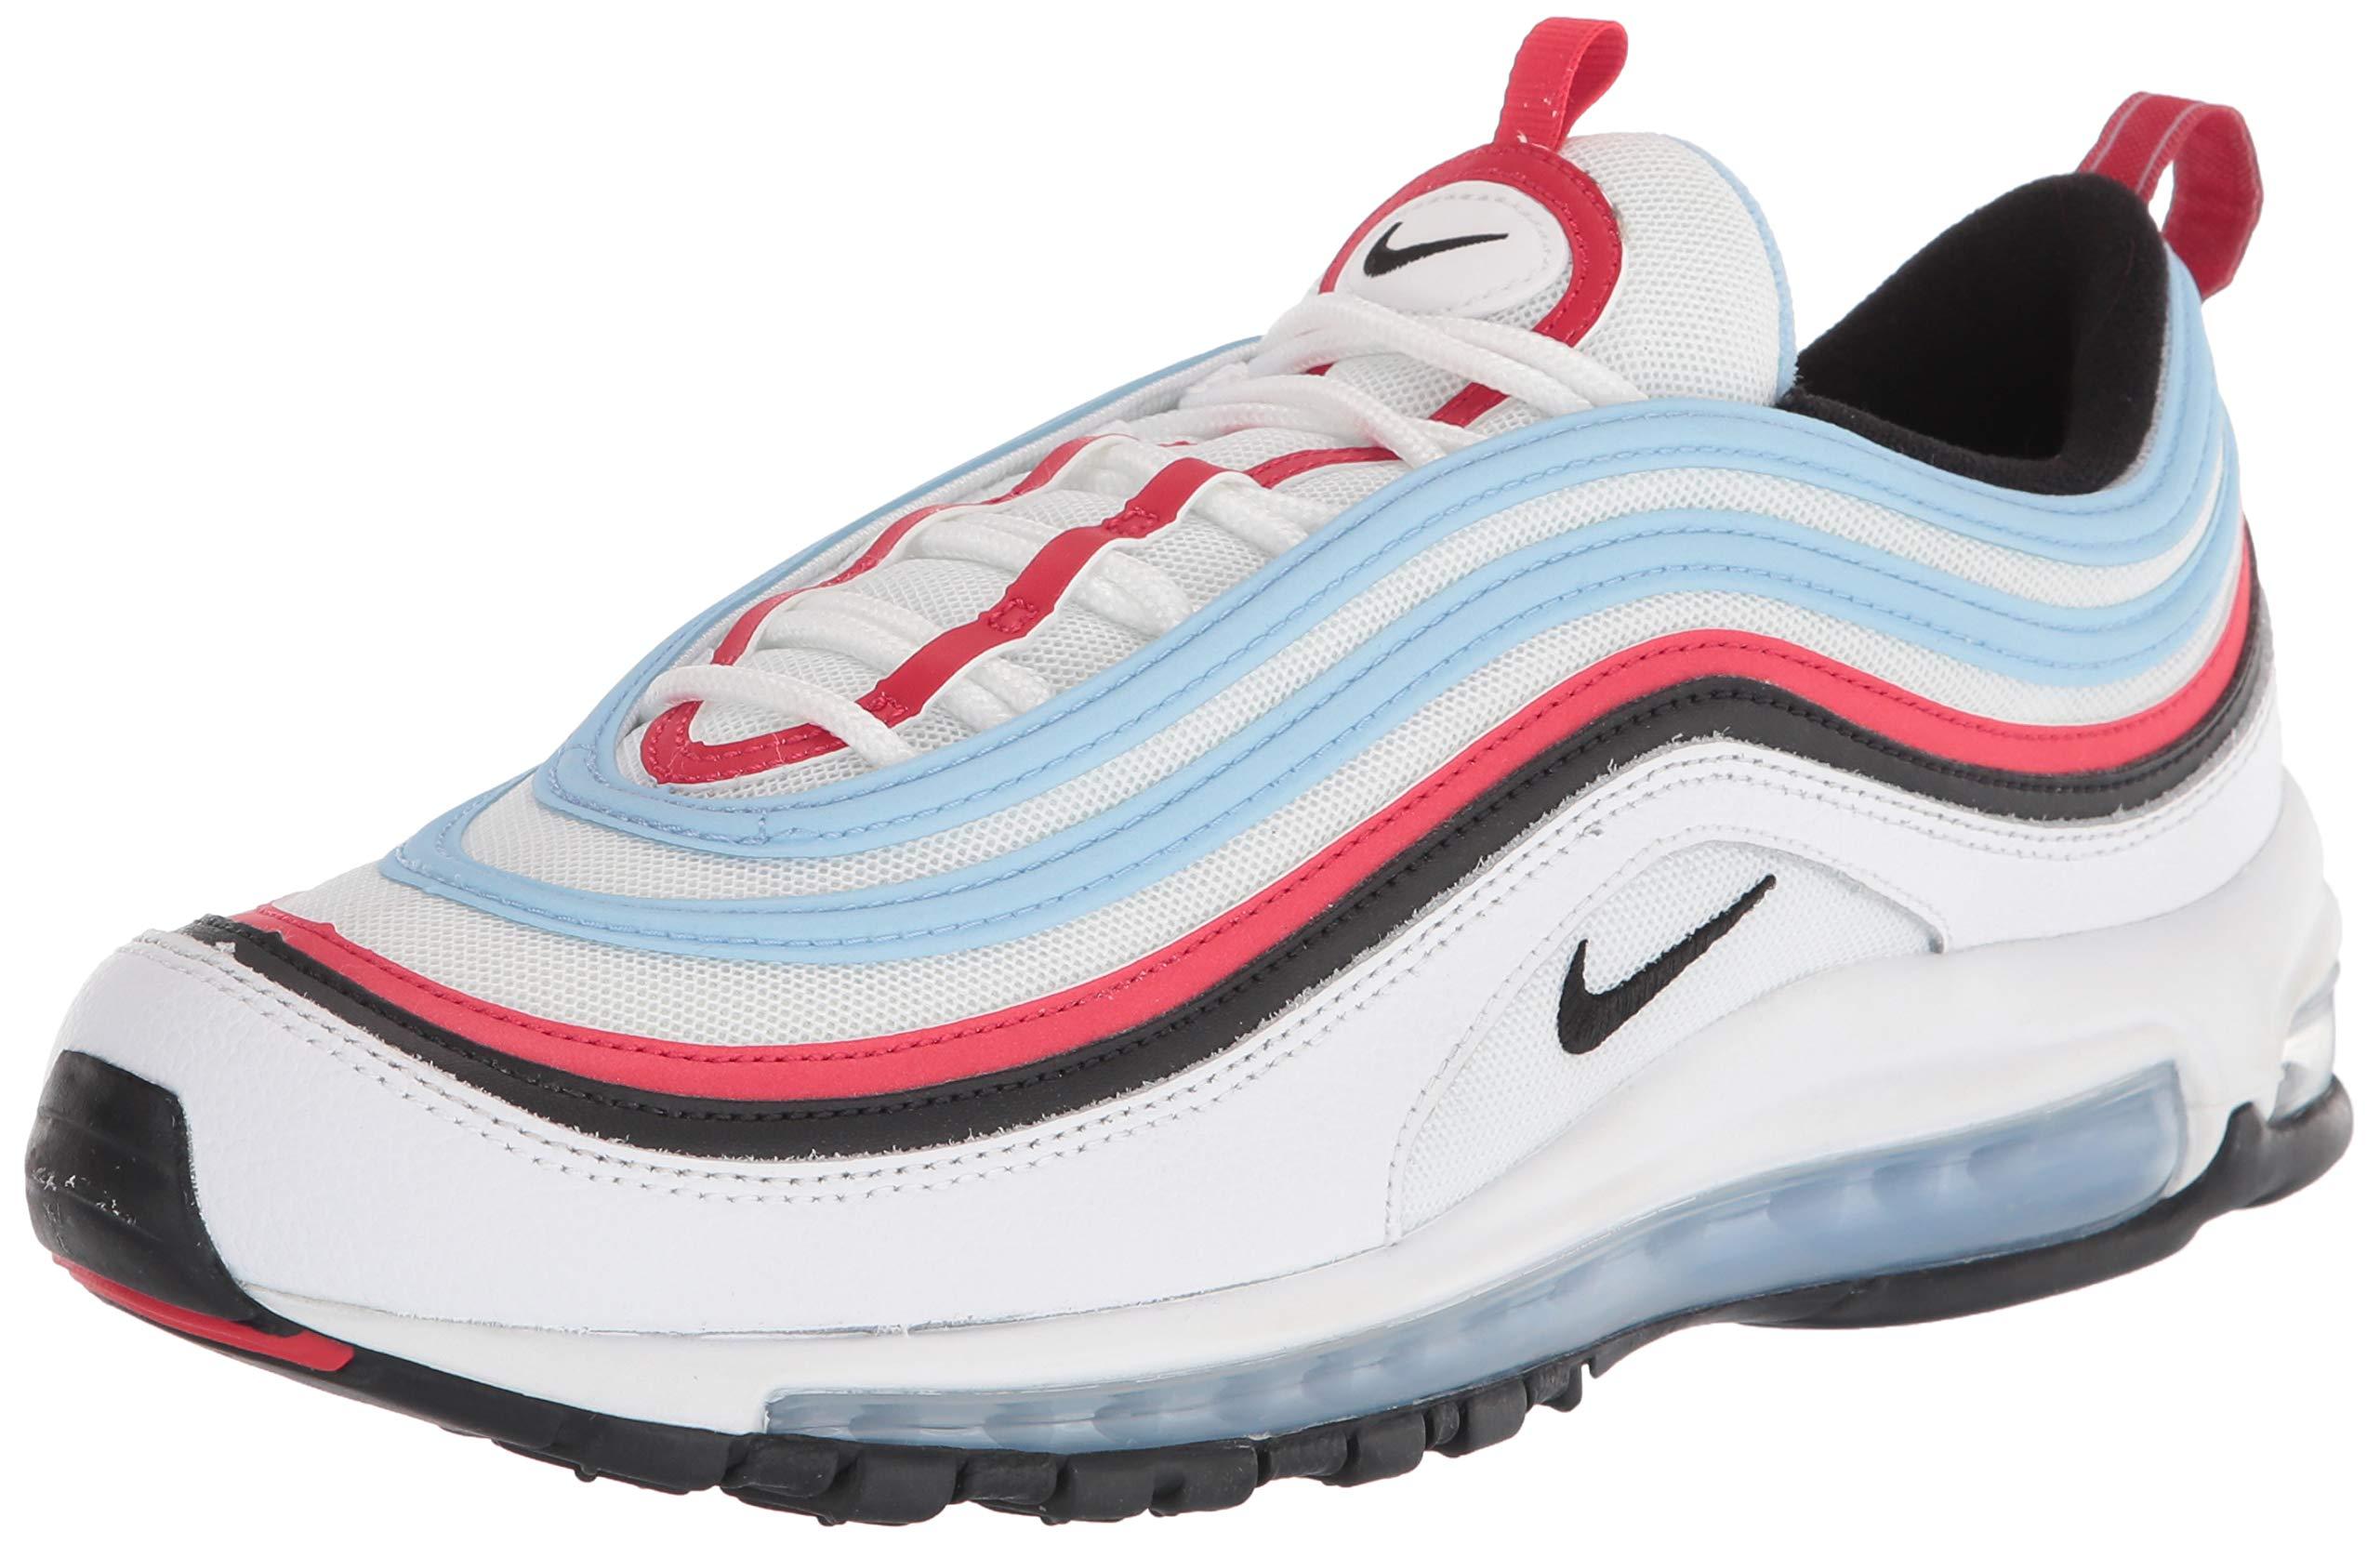 Nike Air Max 97 Mens Casual Fashion Sneaker Cw6986-100 Size 8